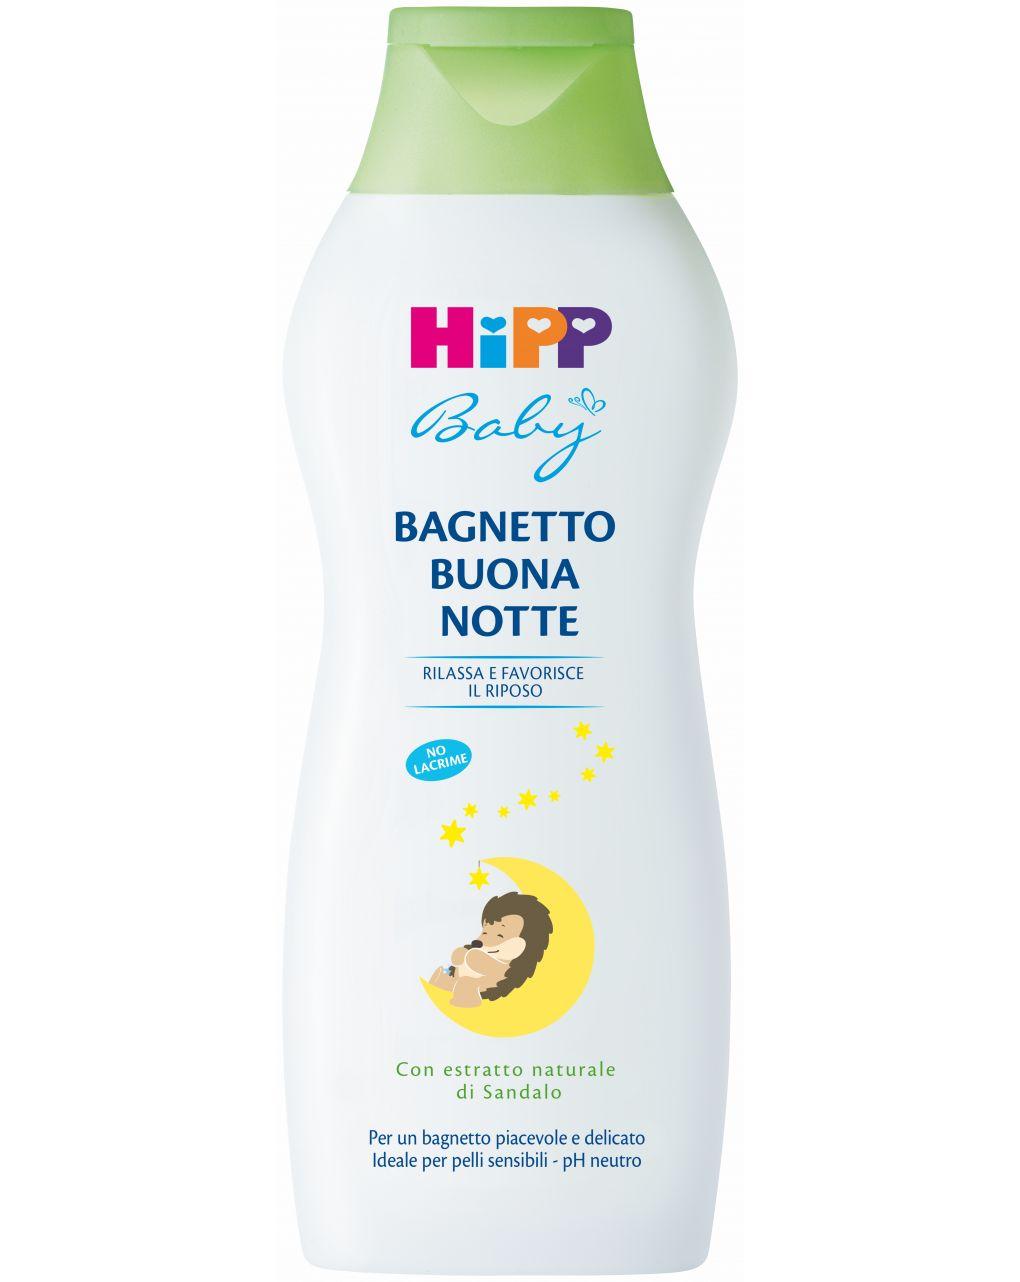 Bagnetto buona notte 350 ml - Hipp